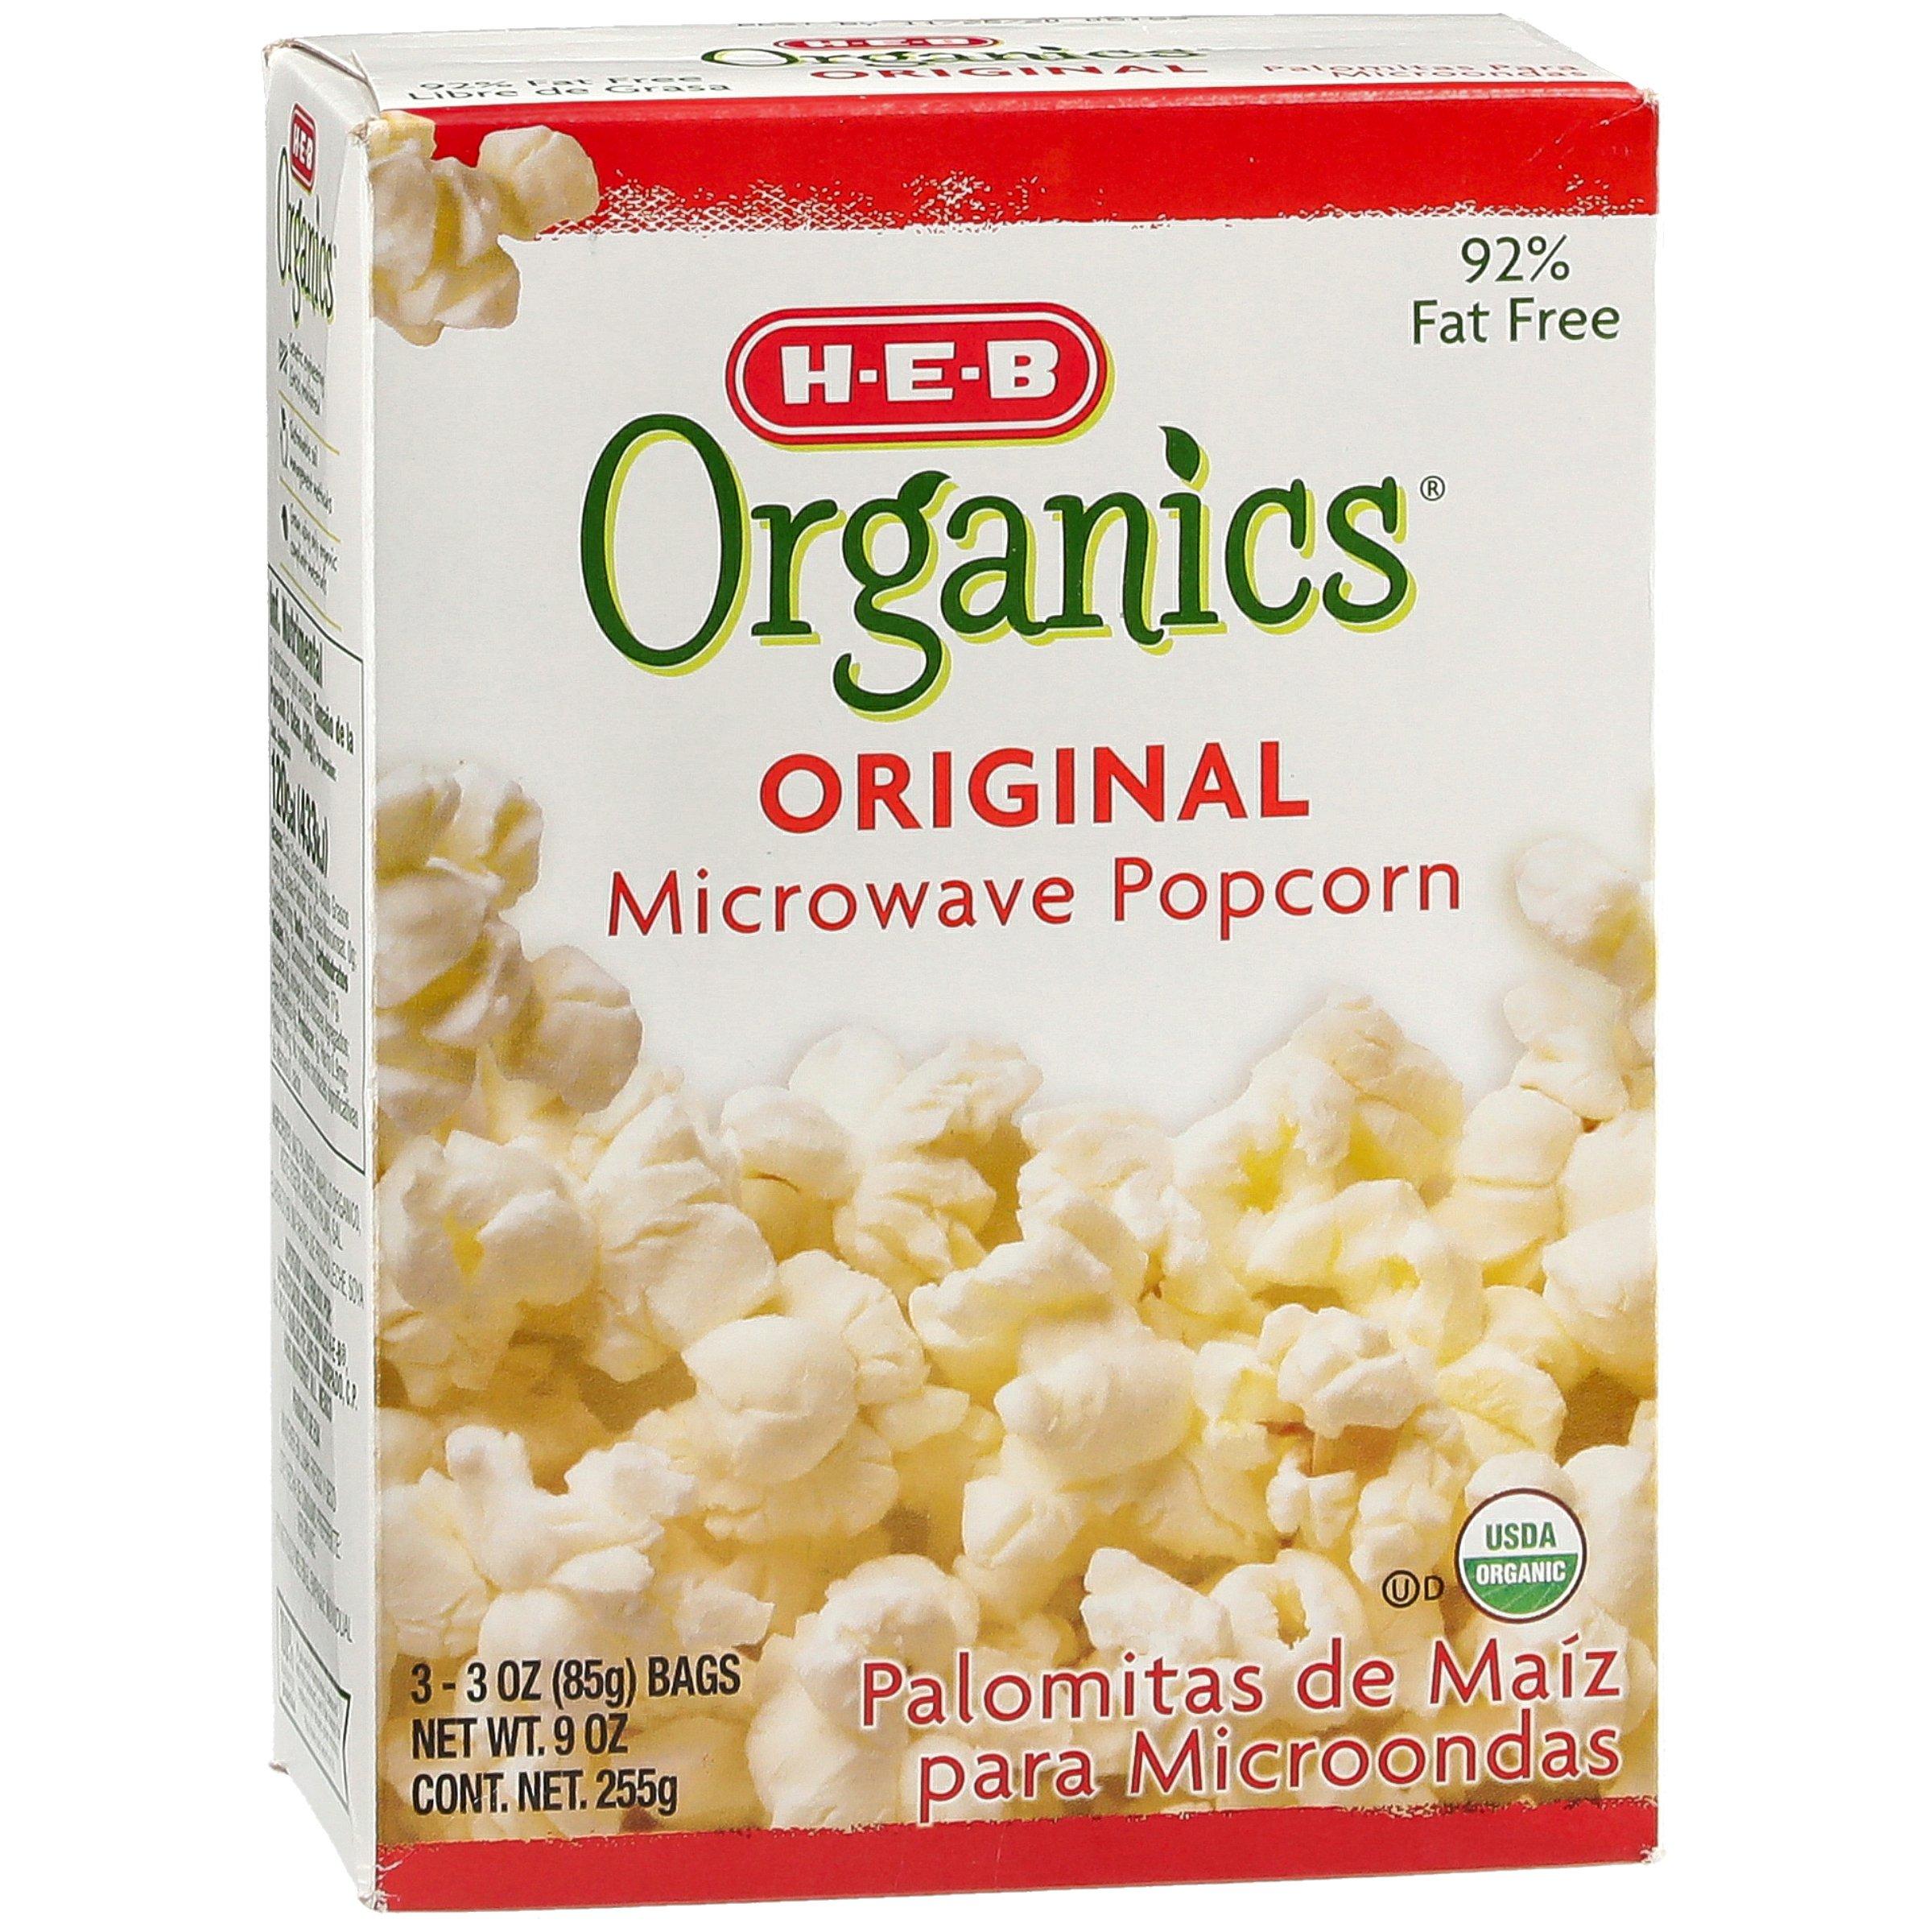 H E B Organics Original Microwave Popcorn Shop Popcorn At H E B